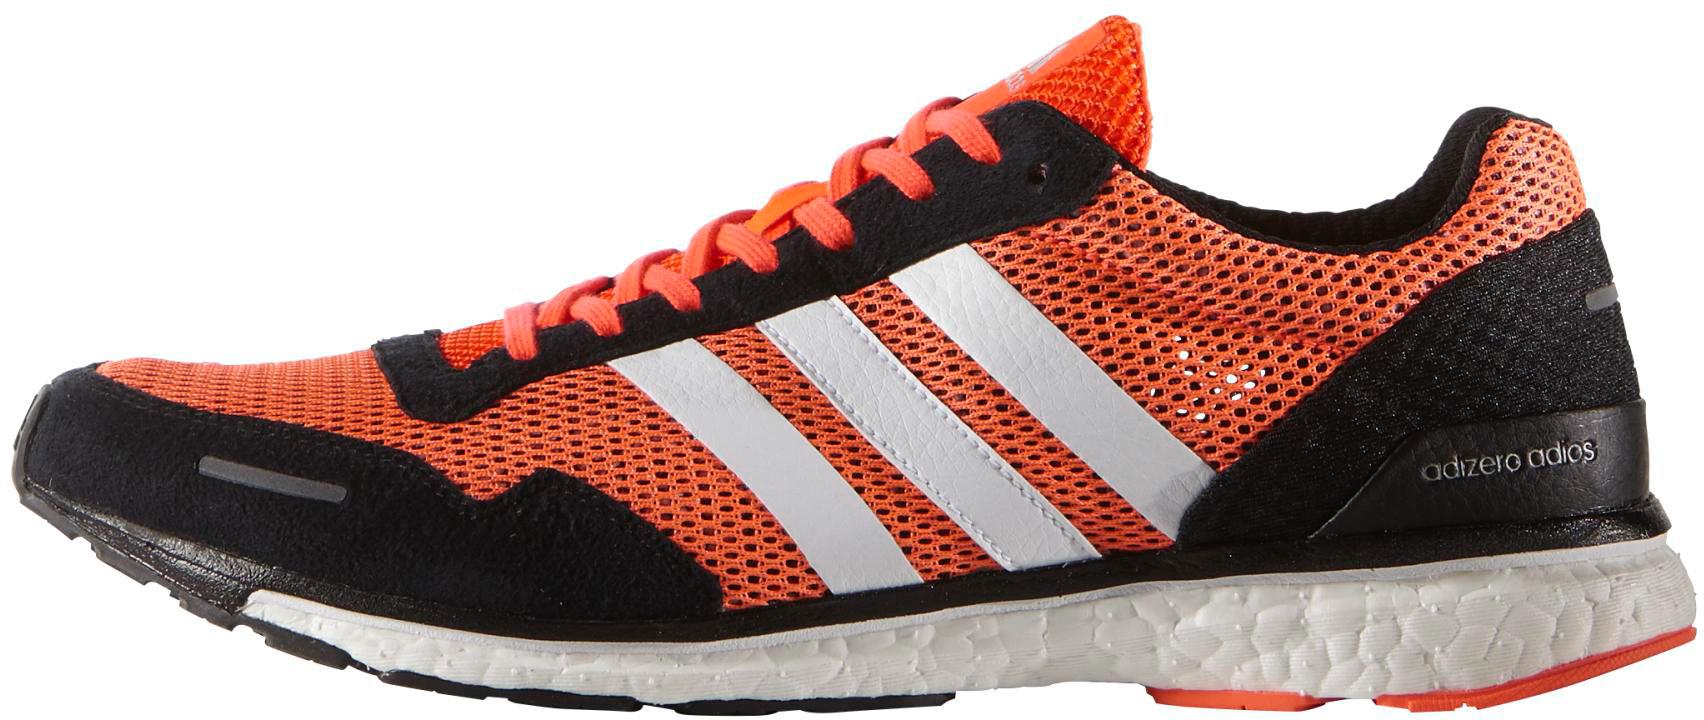 Adios Boost 2 | Adios Boost Adidas | Adidas Adios